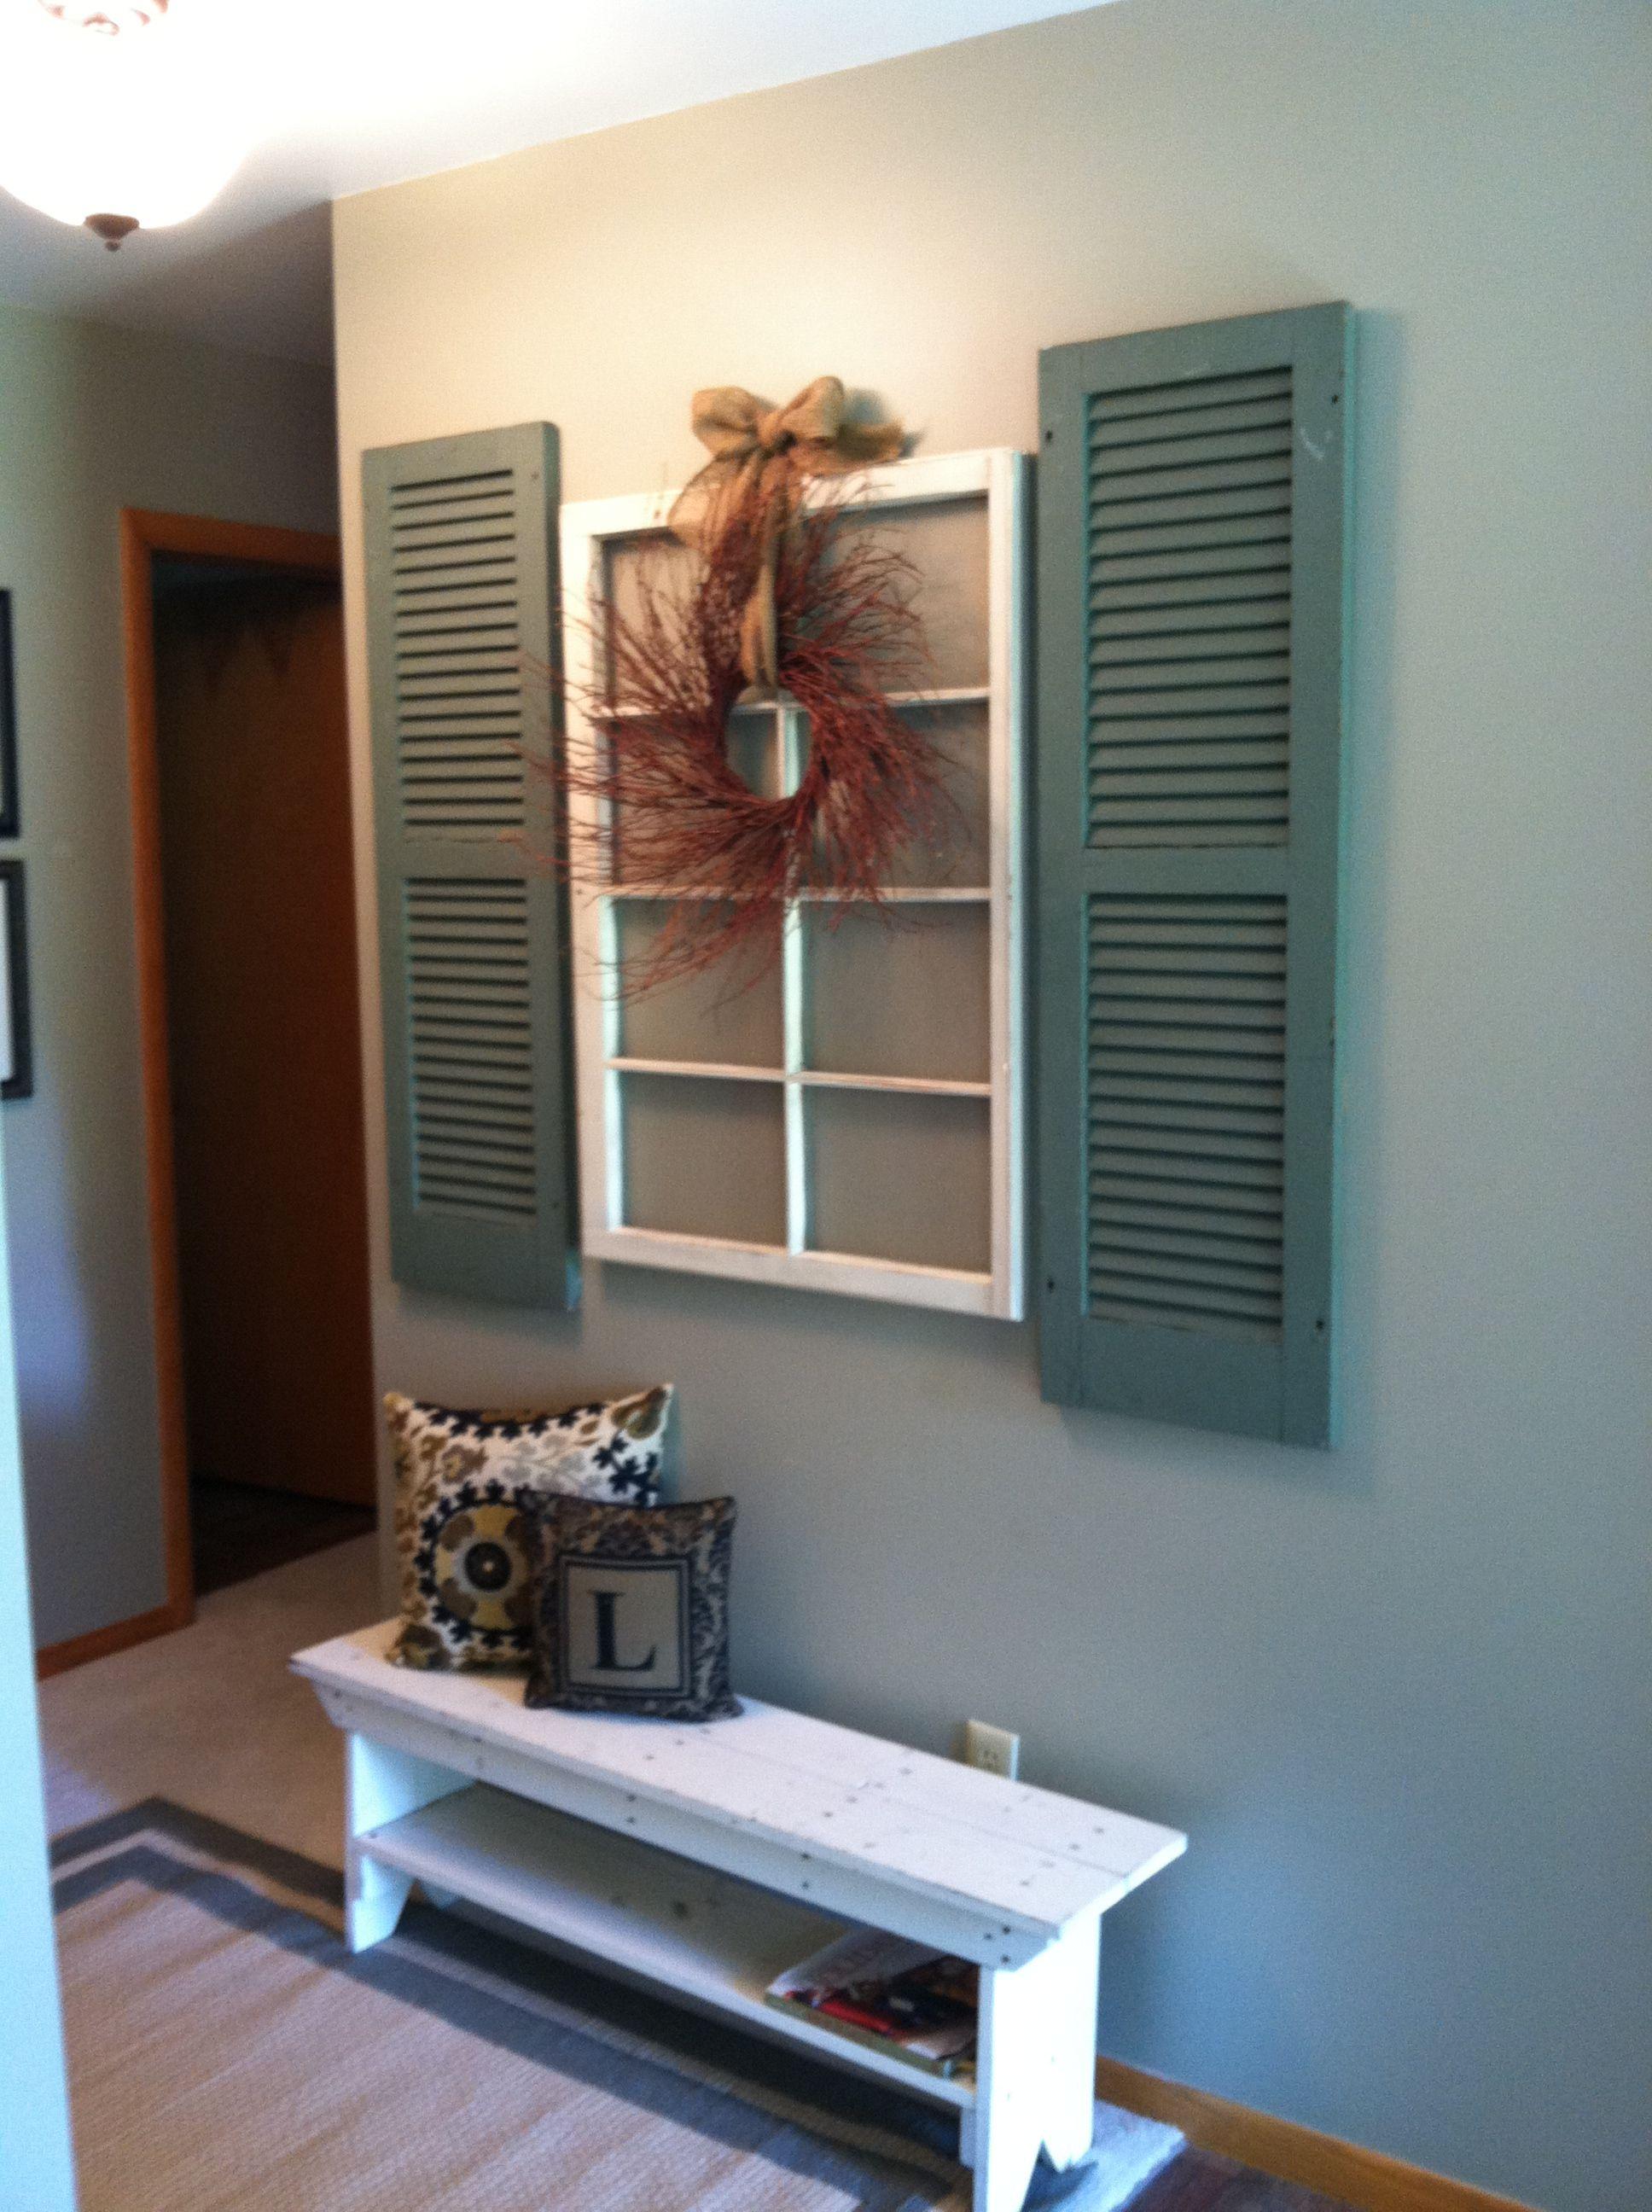 Window pane ideas  simple decor for an entry way  window frame ideas  pinterest  an